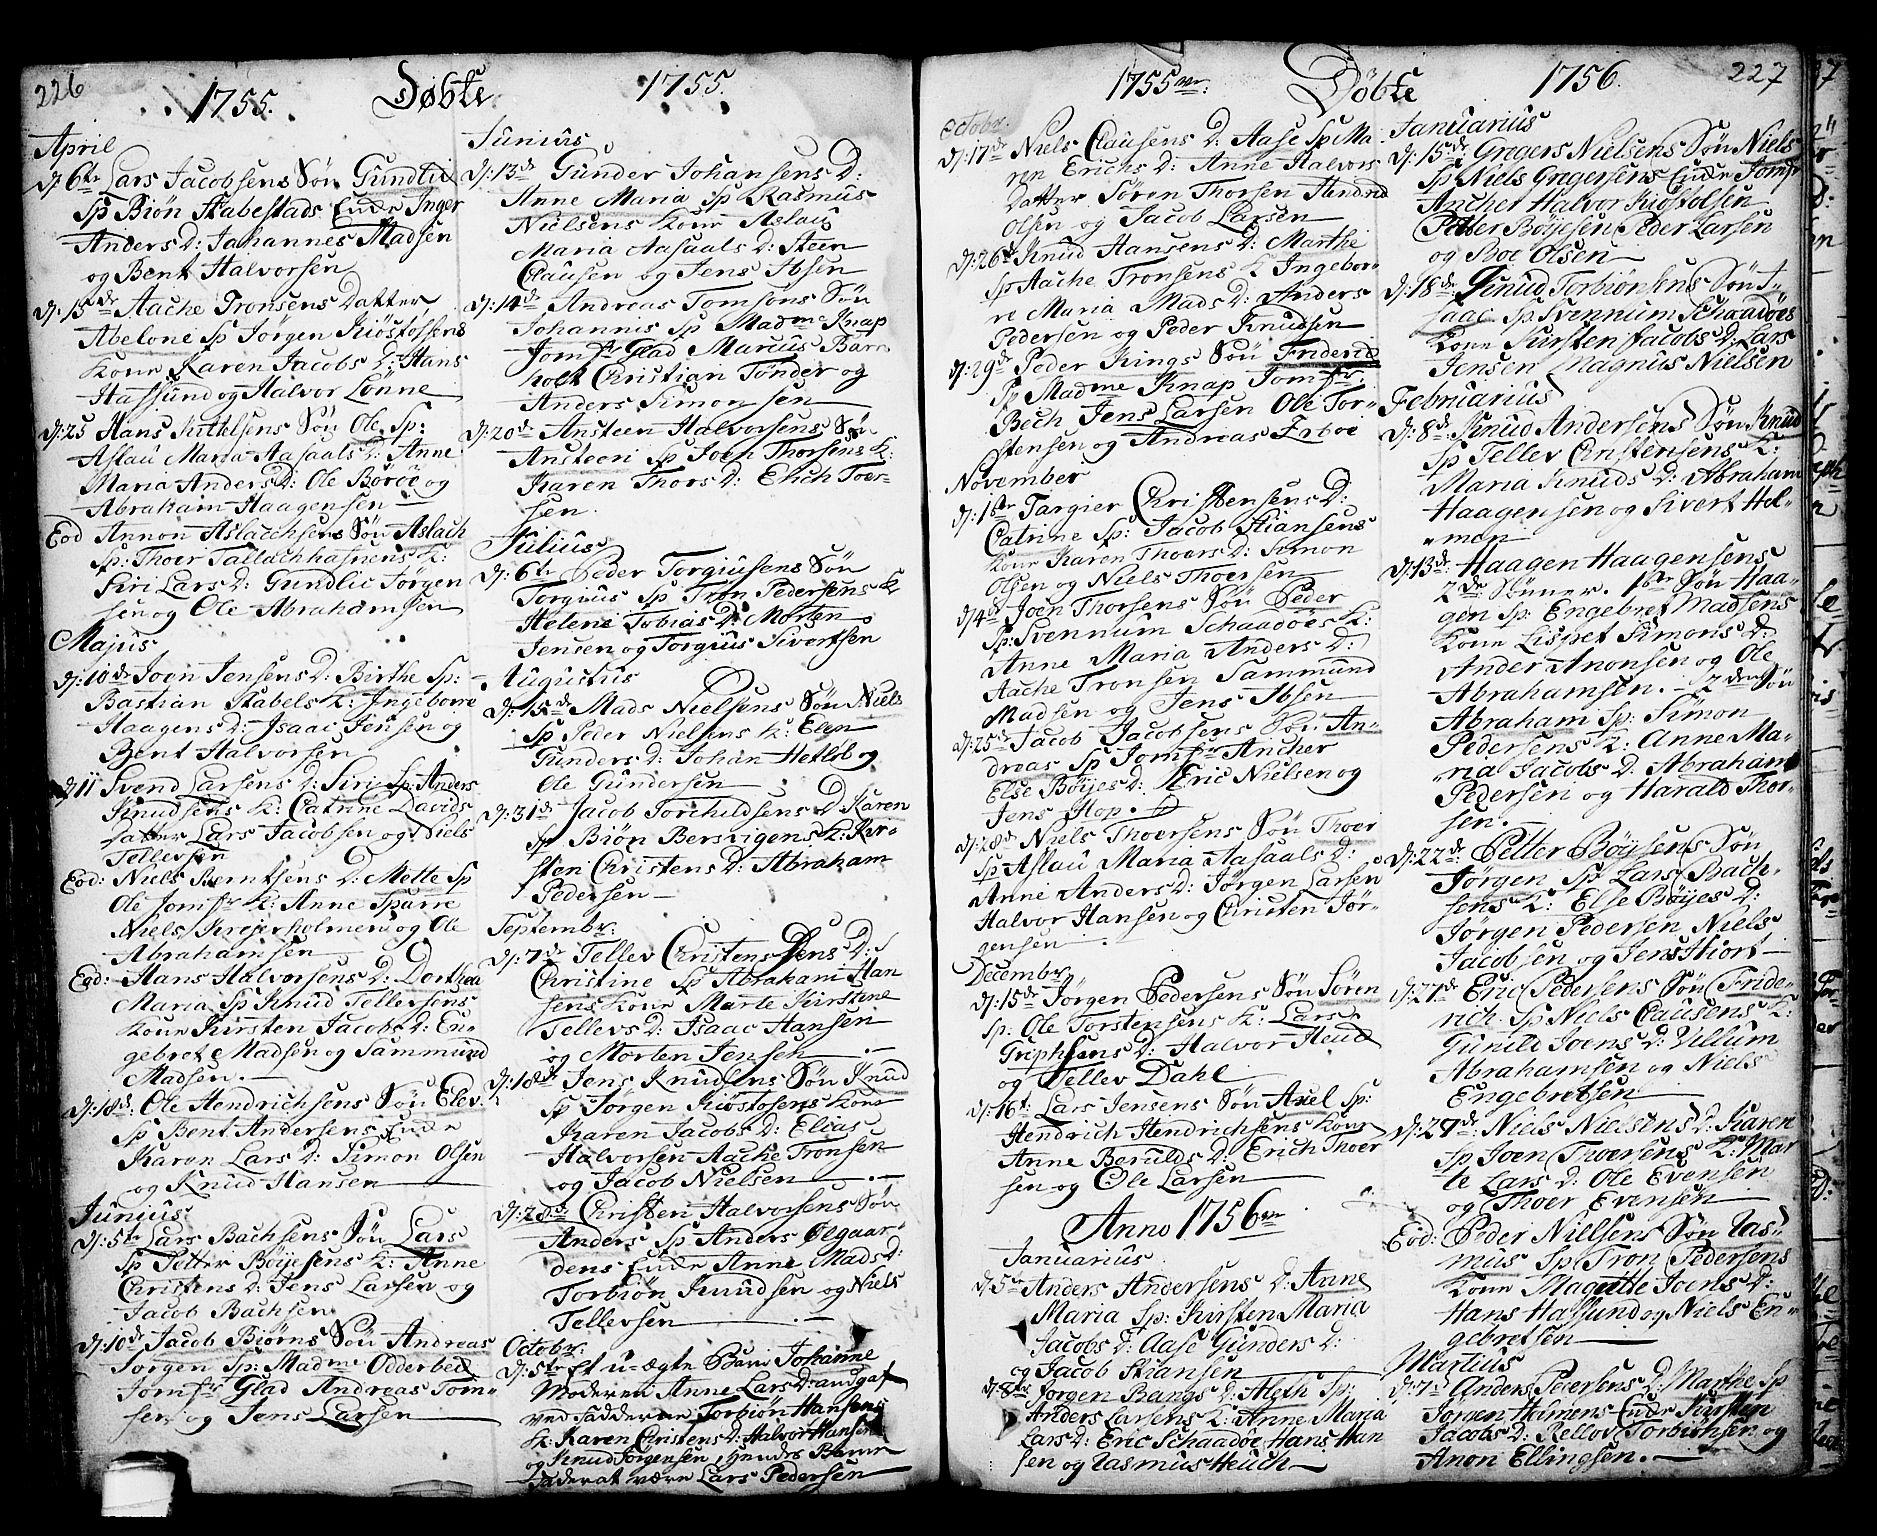 SAKO, Kragerø kirkebøker, F/Fa/L0001: Ministerialbok nr. 1, 1702-1766, s. 226-227